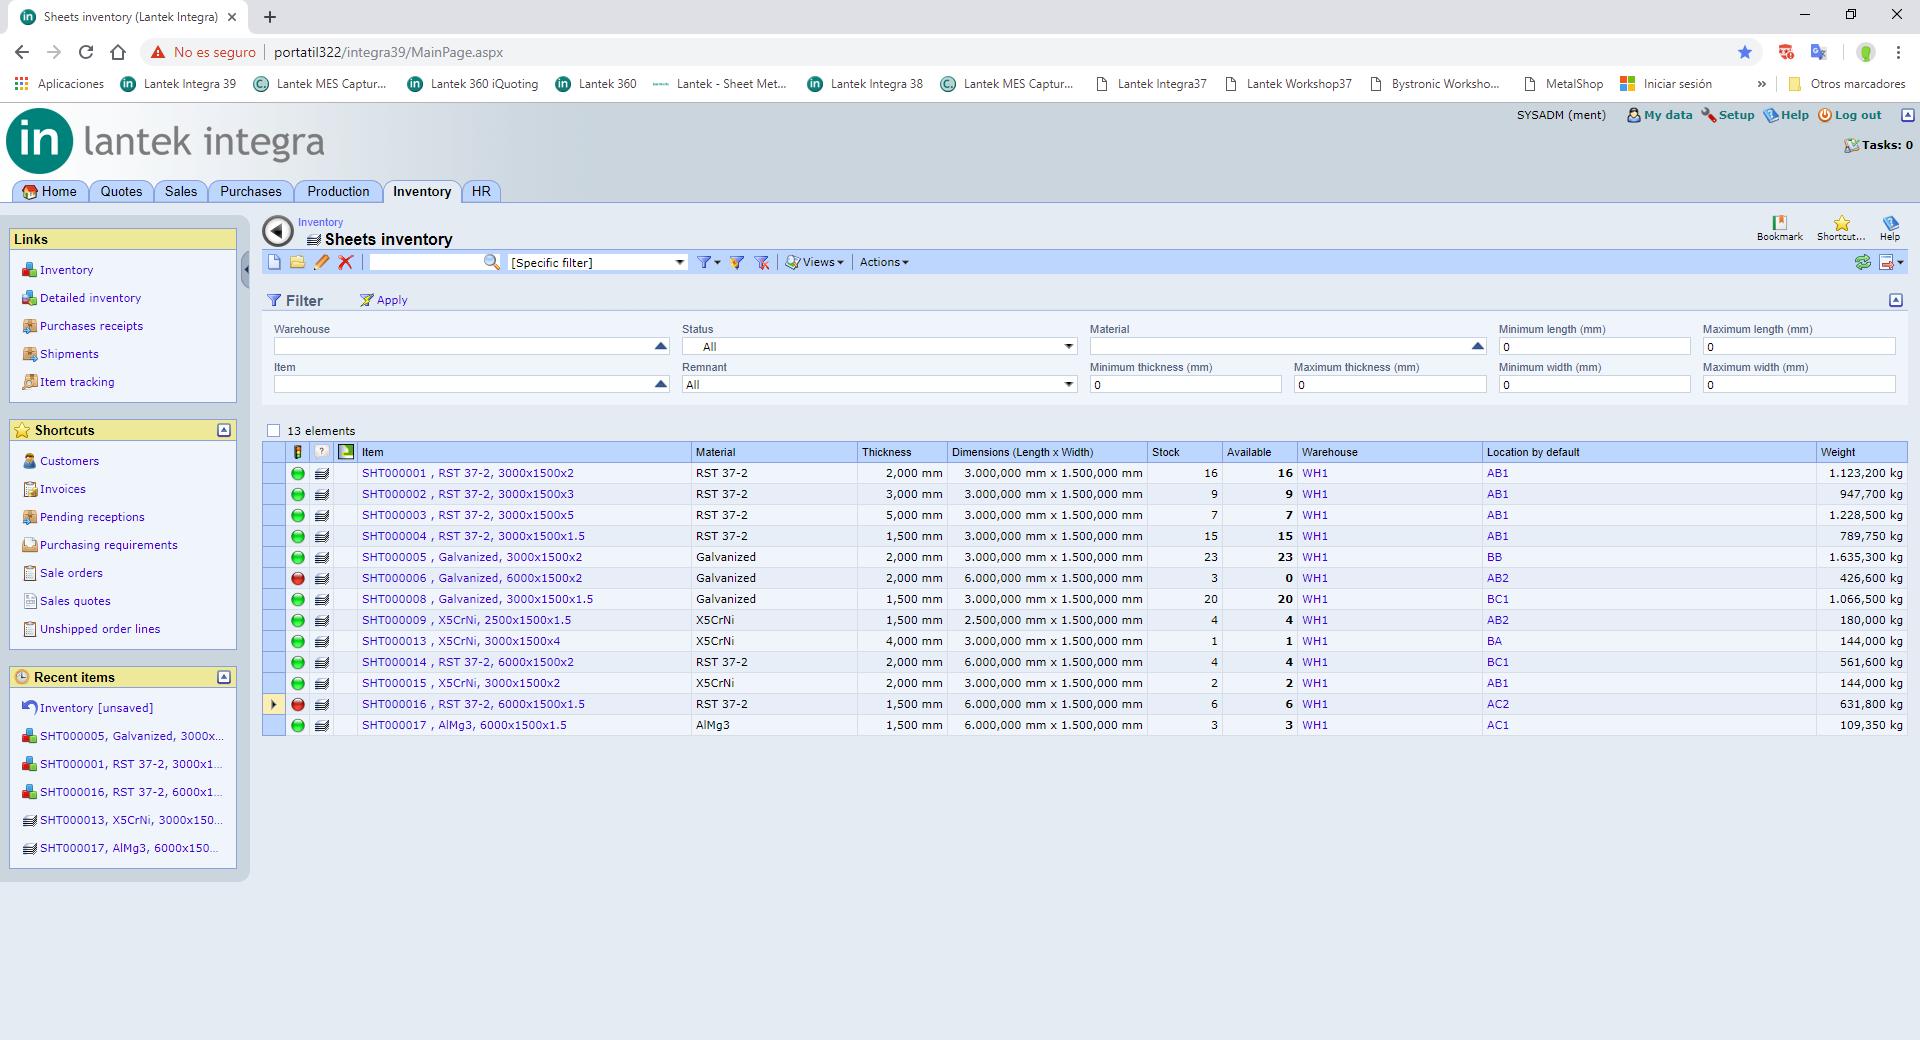 Lantek Integra Inventory  - Movimenti